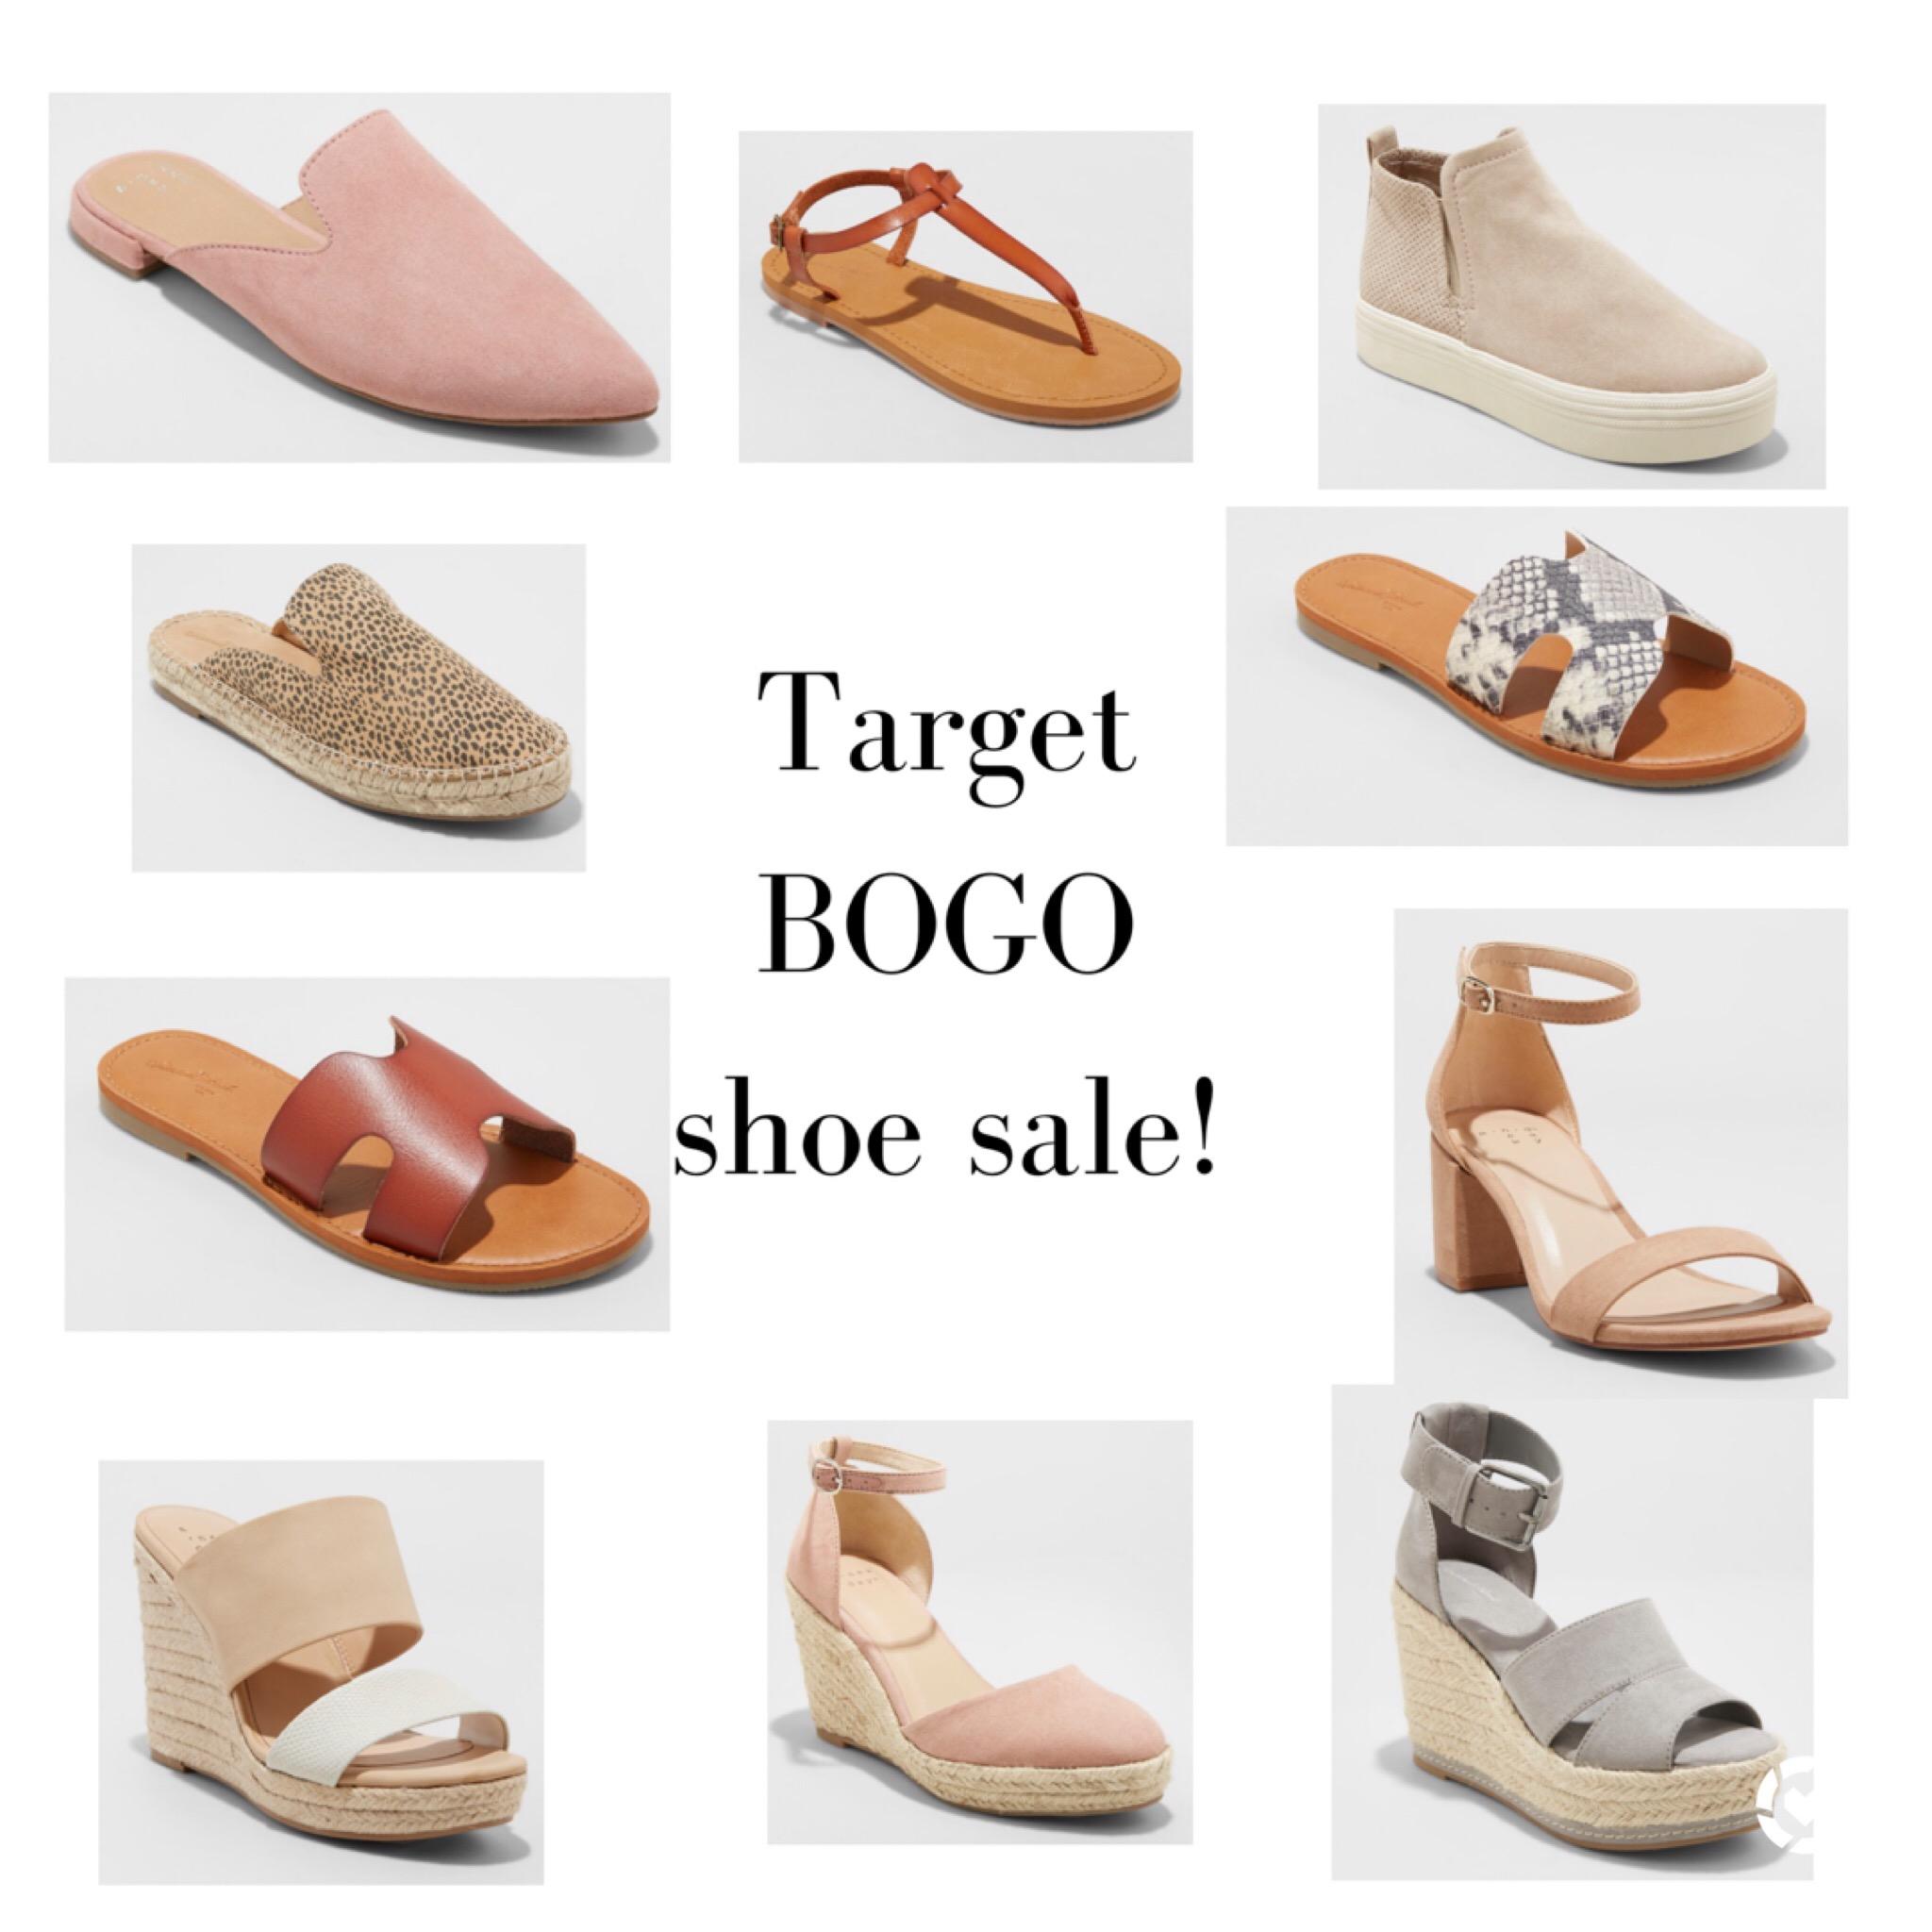 Target BOGO Shoe Sale – Topknots \u0026 My